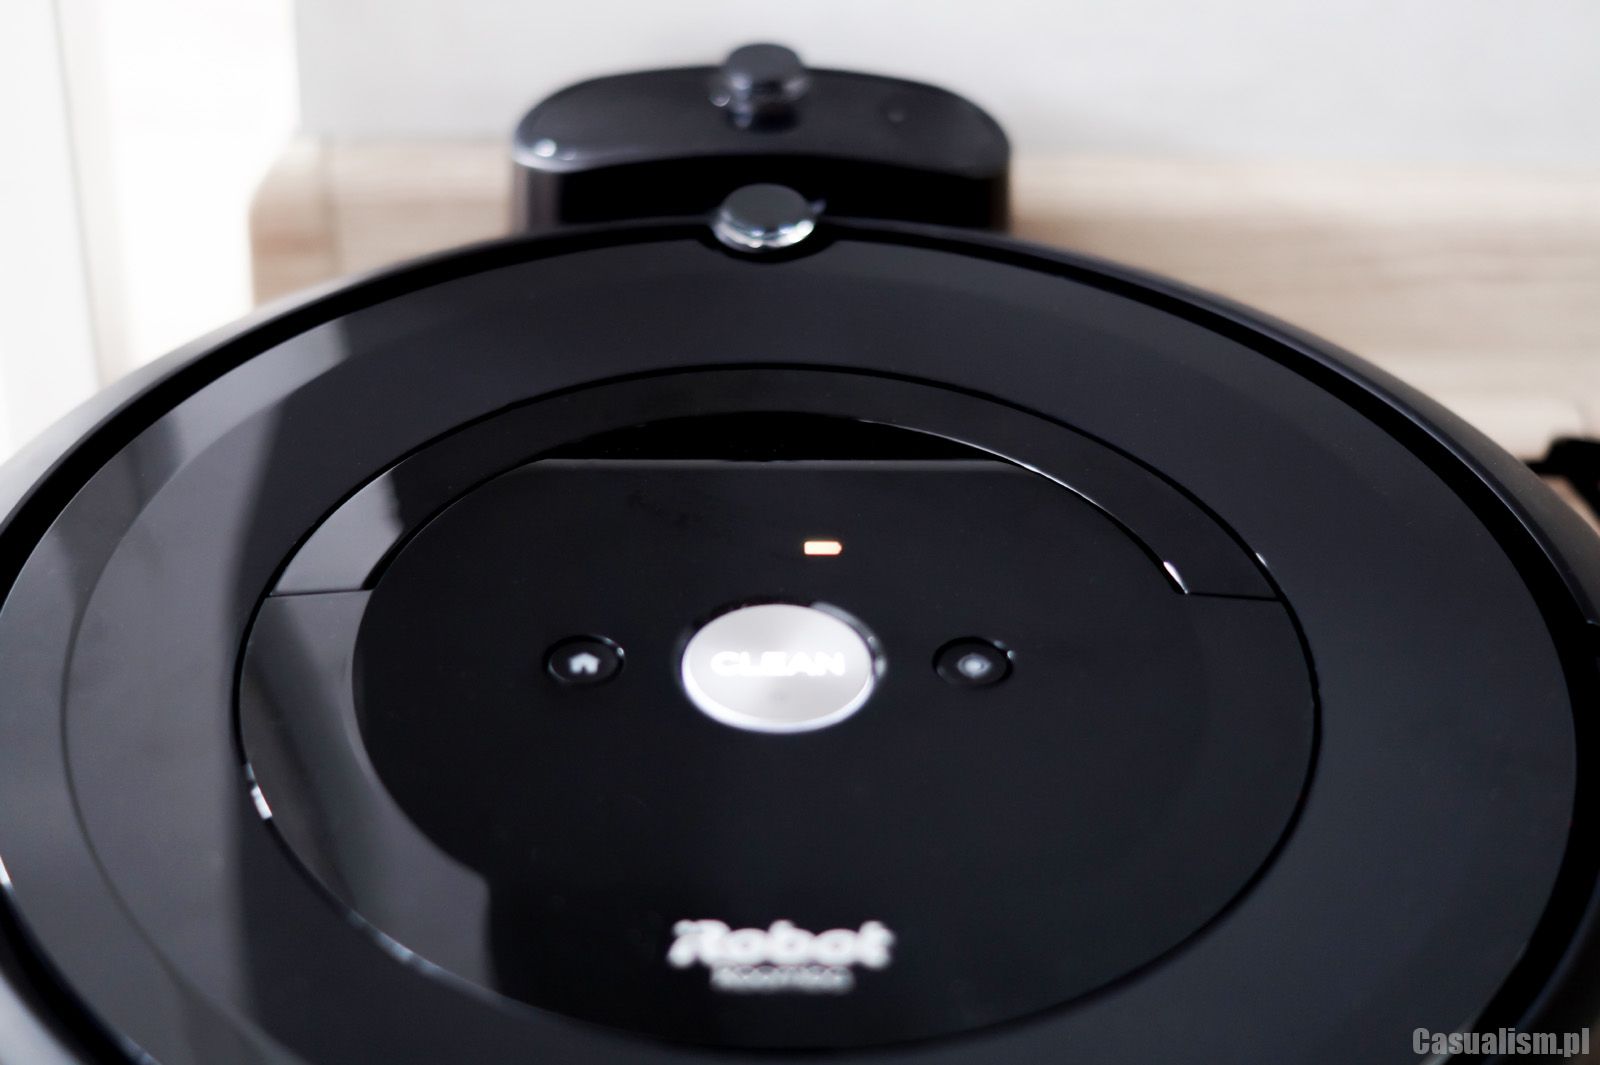 irobot roomba recenzja, recenzja roomba, recenzja irobot roomba, robot recenzja, roomba recenzja, opinie irobot roomba, opinie roomba